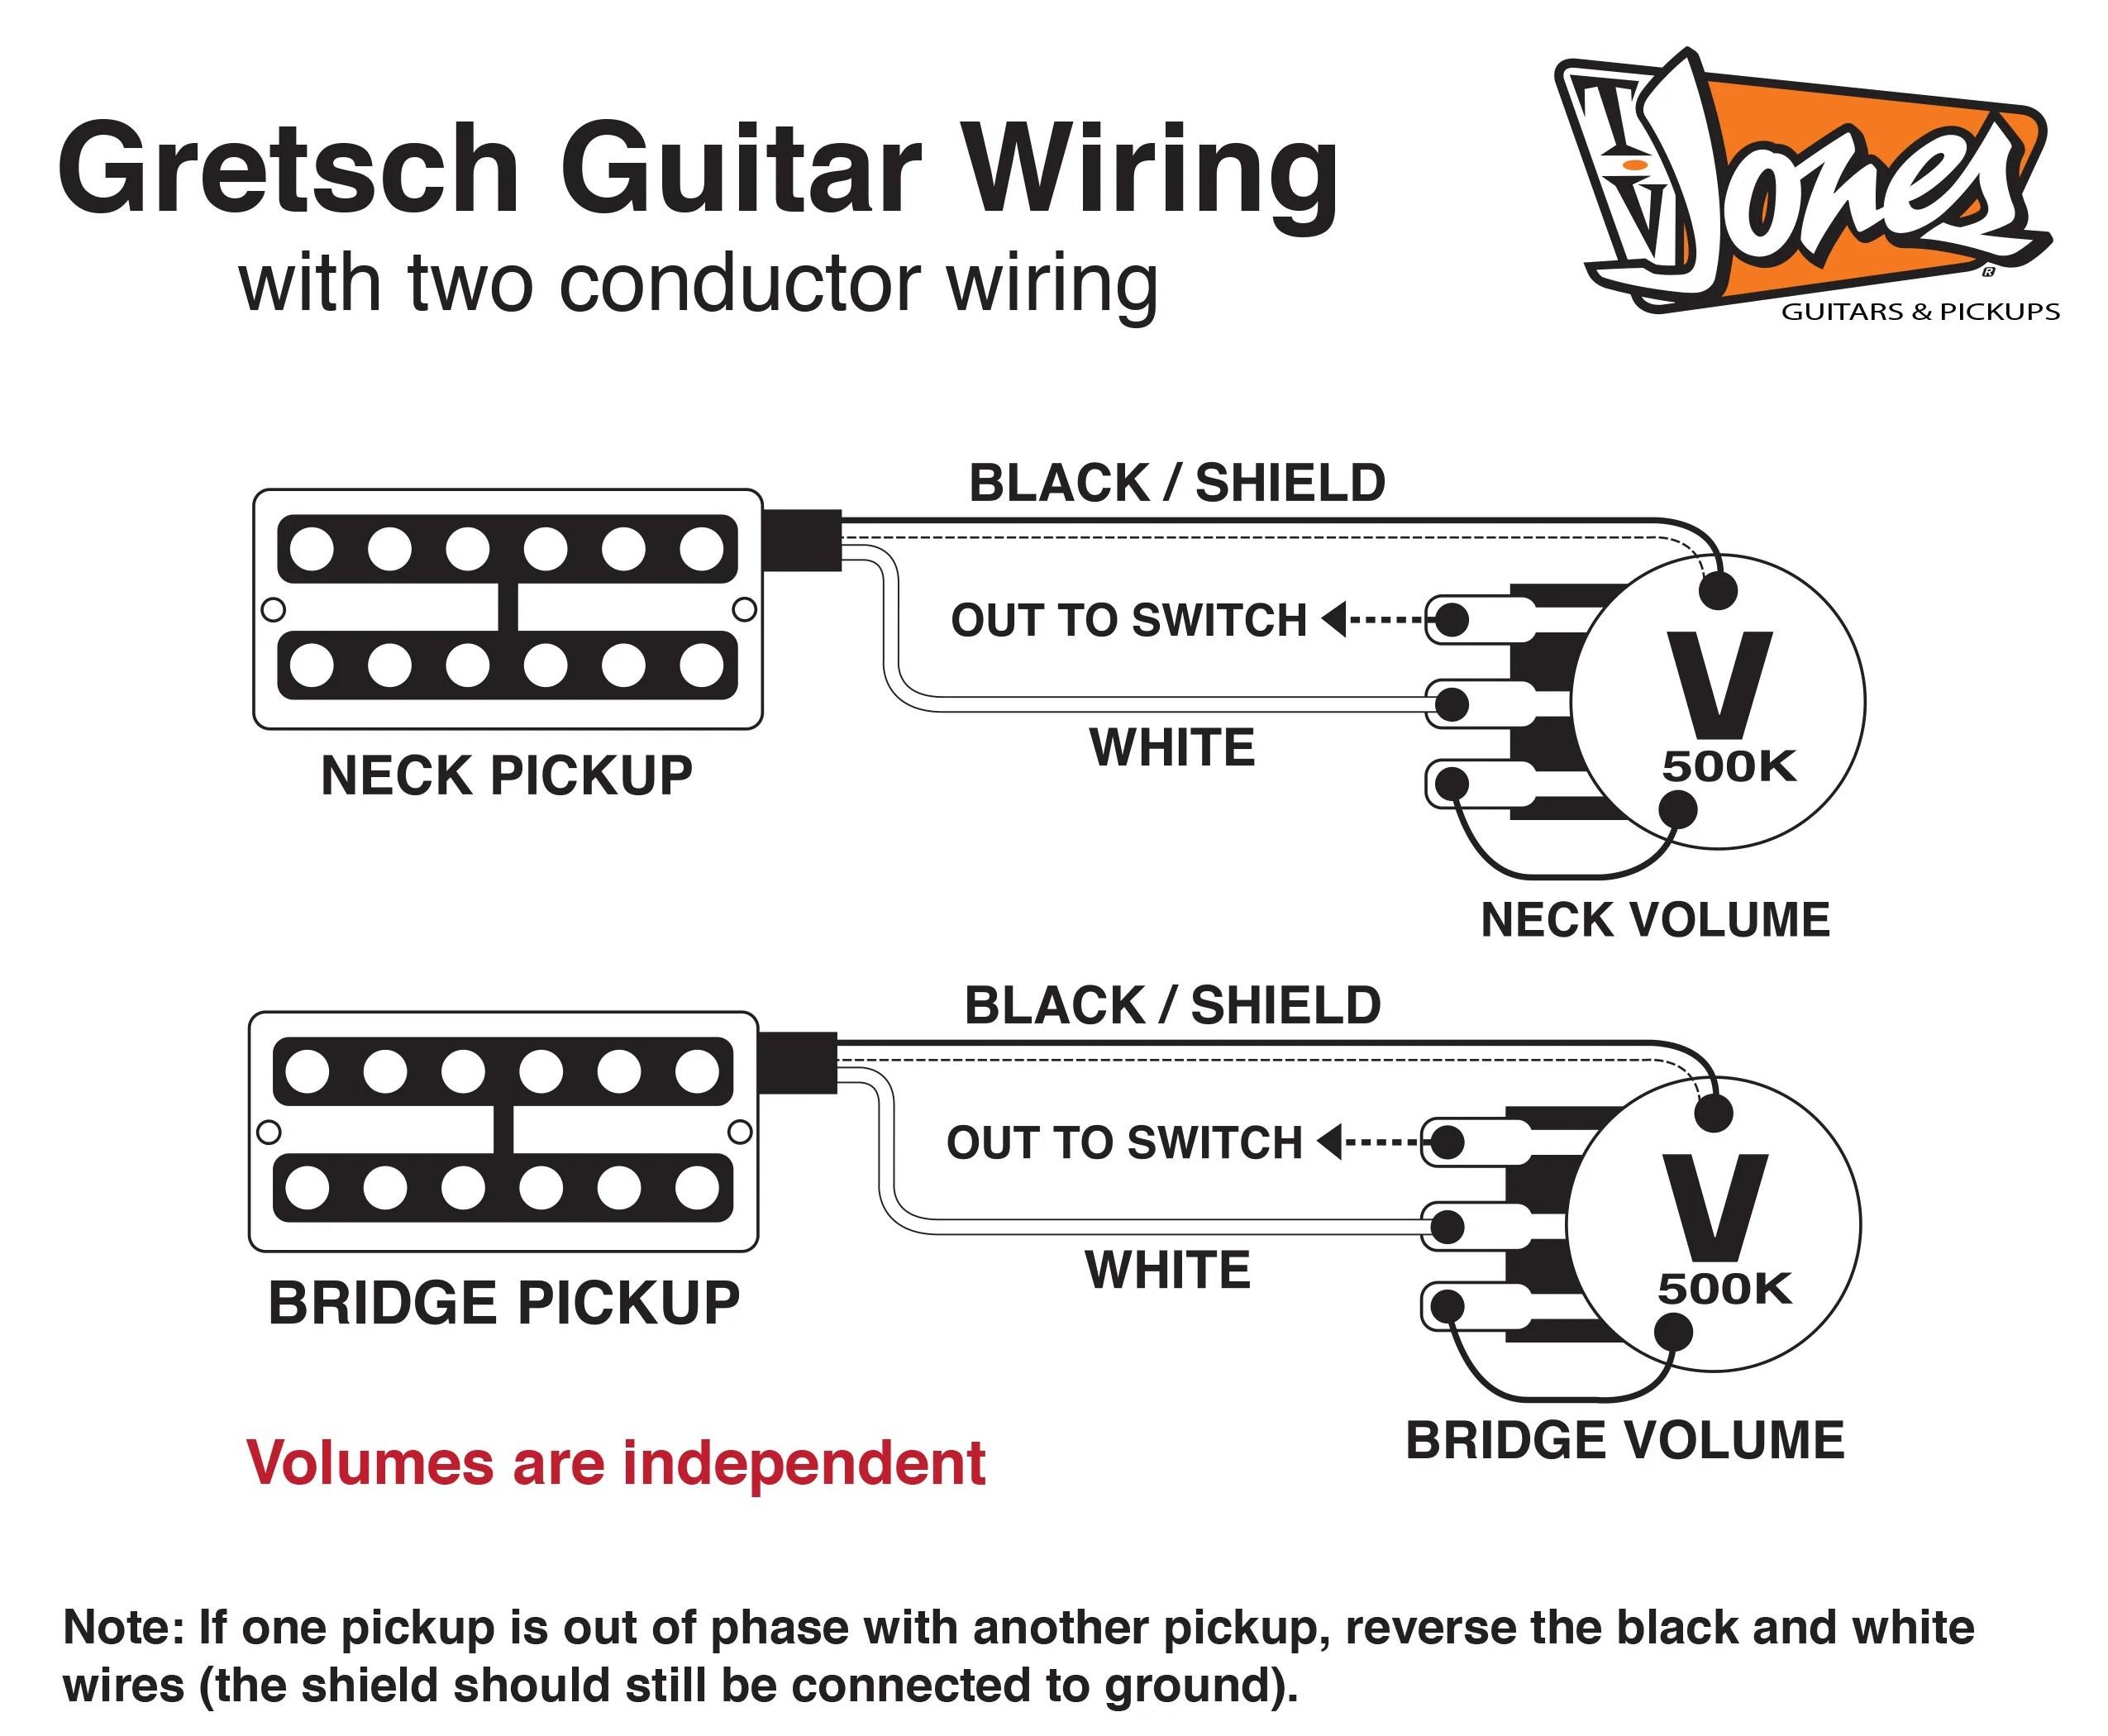 Gretsch Guitar Wiring Diagram